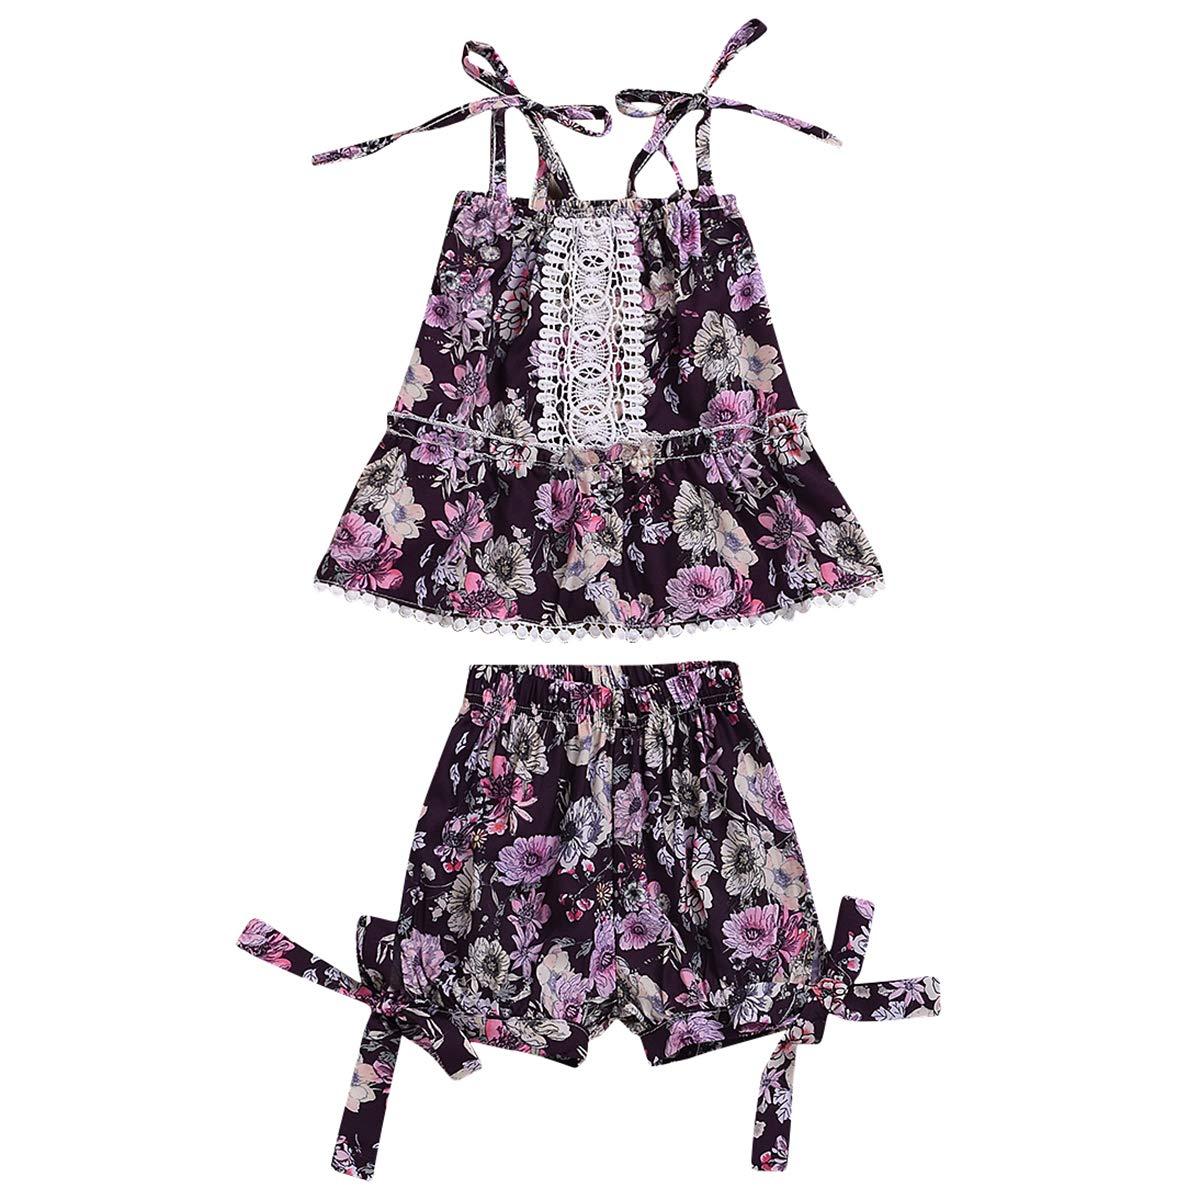 Tianhaik Baby Girls All Floral Print Spaghetti Strap Tank Top+Bowknot Cotton Shorts Babysuit